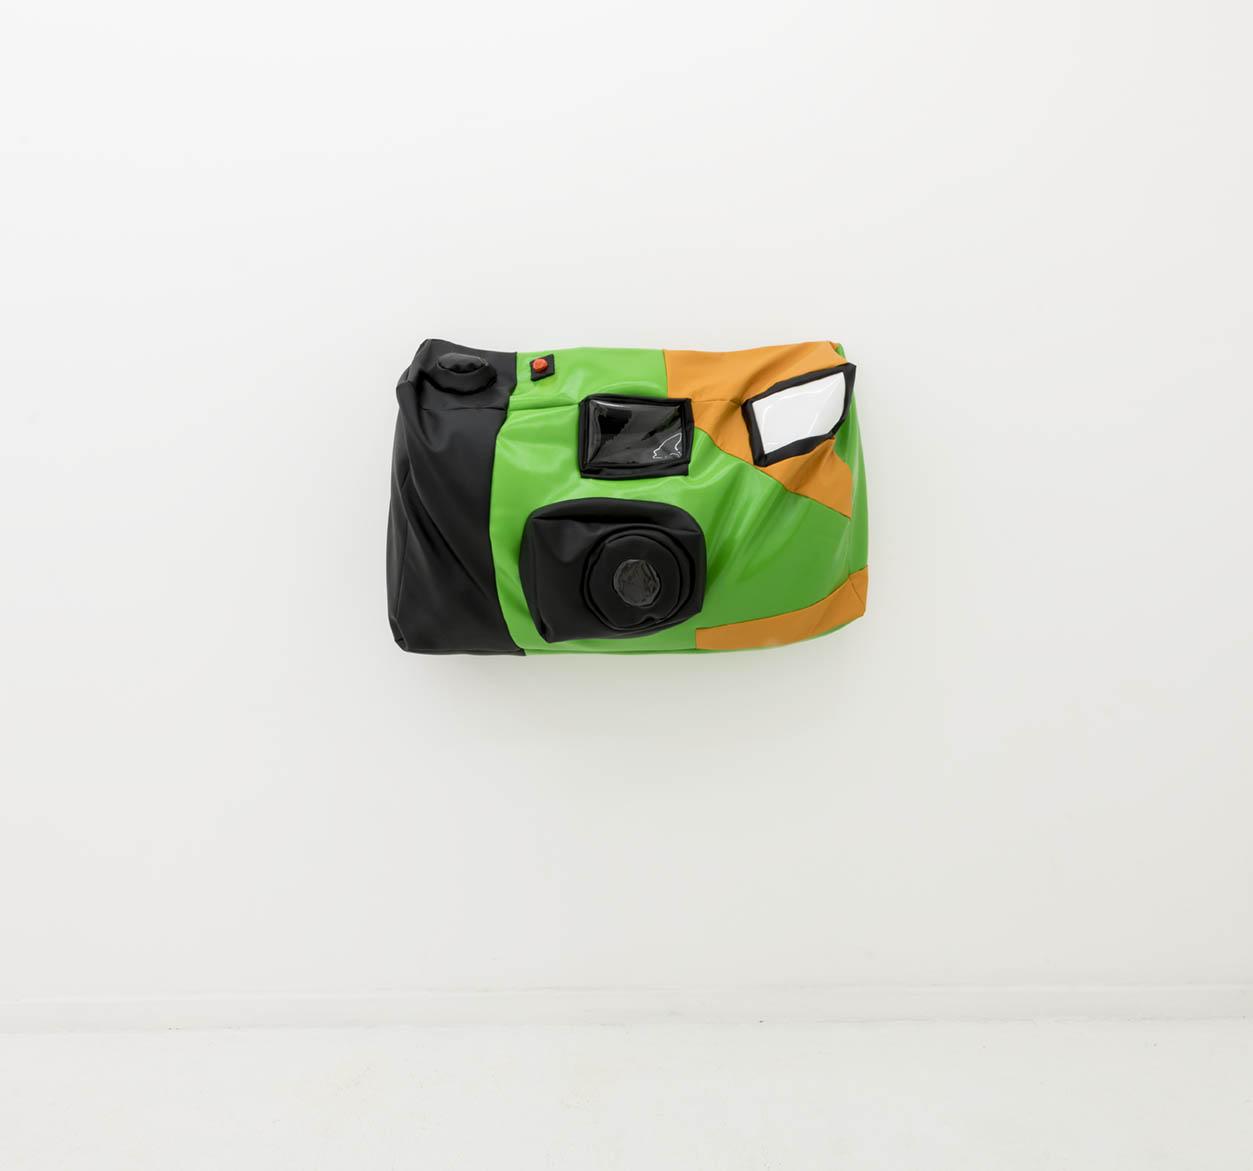 Câmera descartável mole |  Soft Disposable Camera , 2019  couro sintético e enchimento de poliéster |  Pleather and polyester fill   54.5 x 106.7 x 25.5 cm |  21.5 x 42 x 10 inches